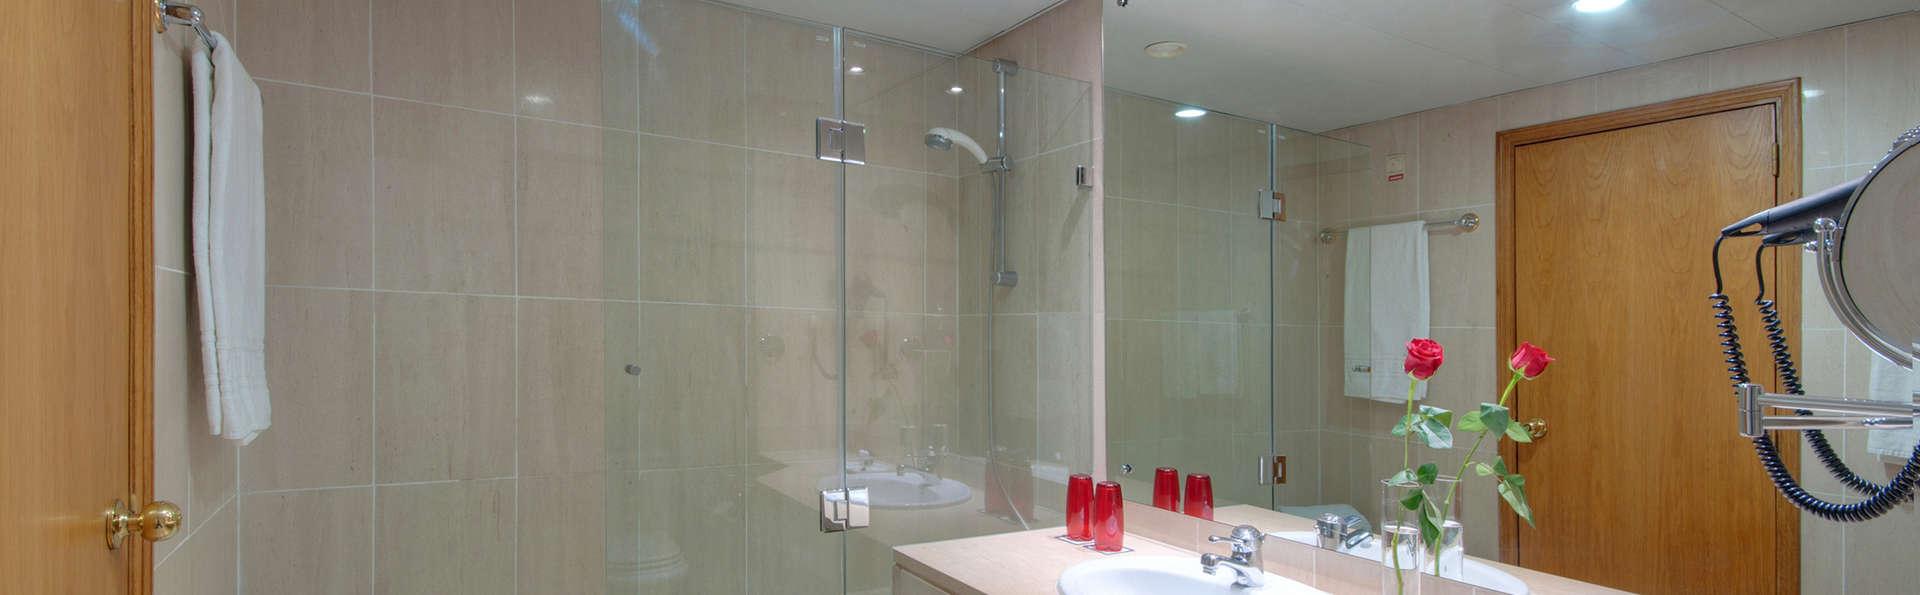 Tryp Coimbra - EDIT_bath.jpg